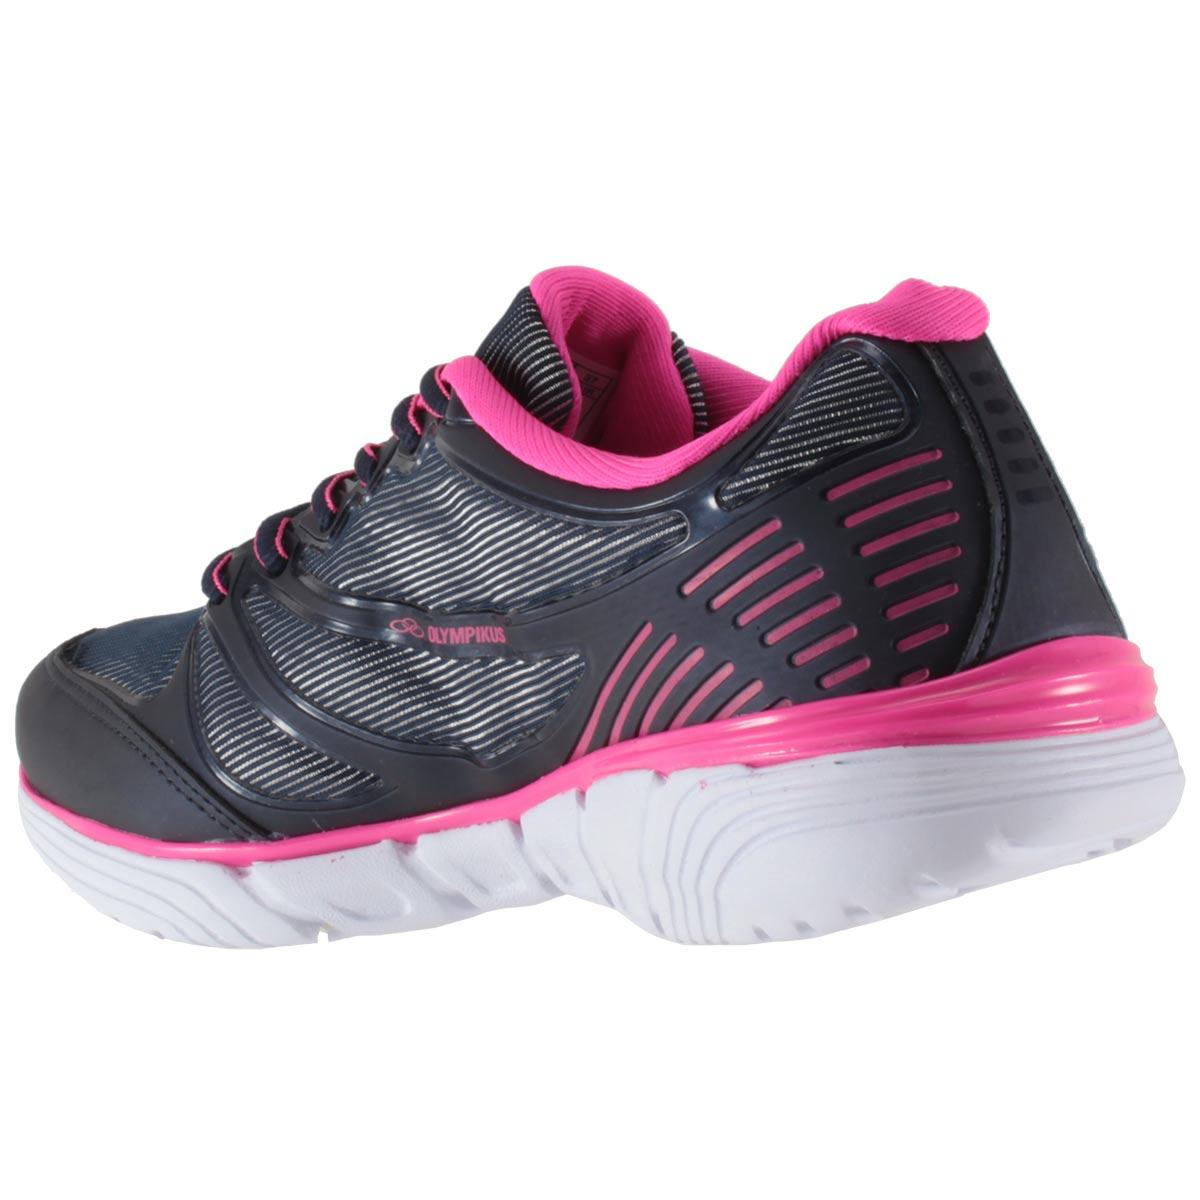 ... Tênis Olympikus Mist 2 Feminino Caminhada Corrida Running 344 ... 359a0acb954be